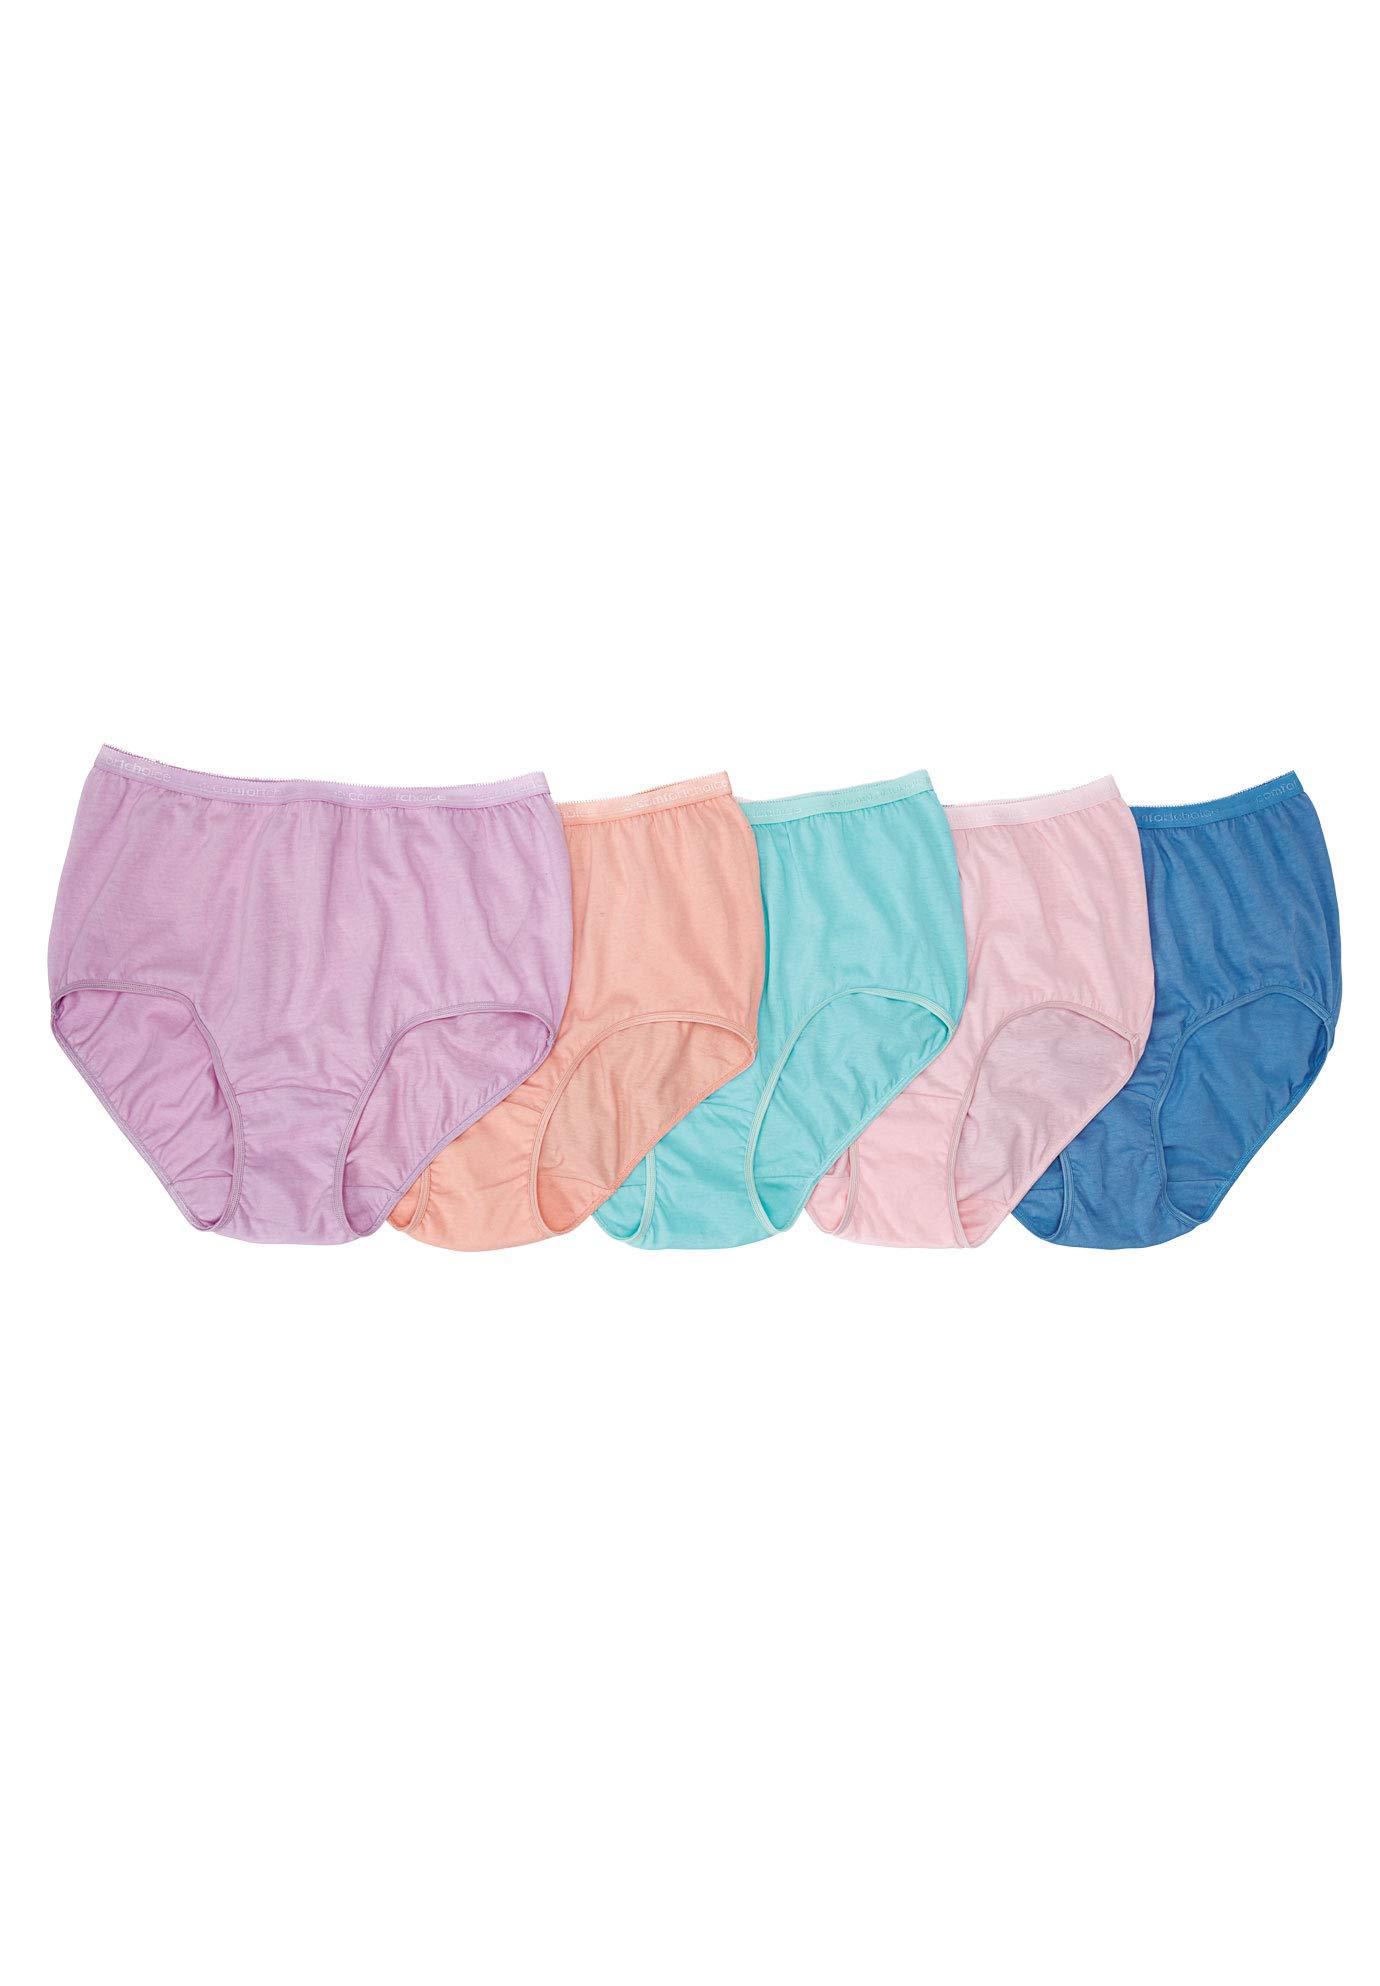 Comfort Choice Women's Plus Size 10-Pack Nylon Full-Cut Brief